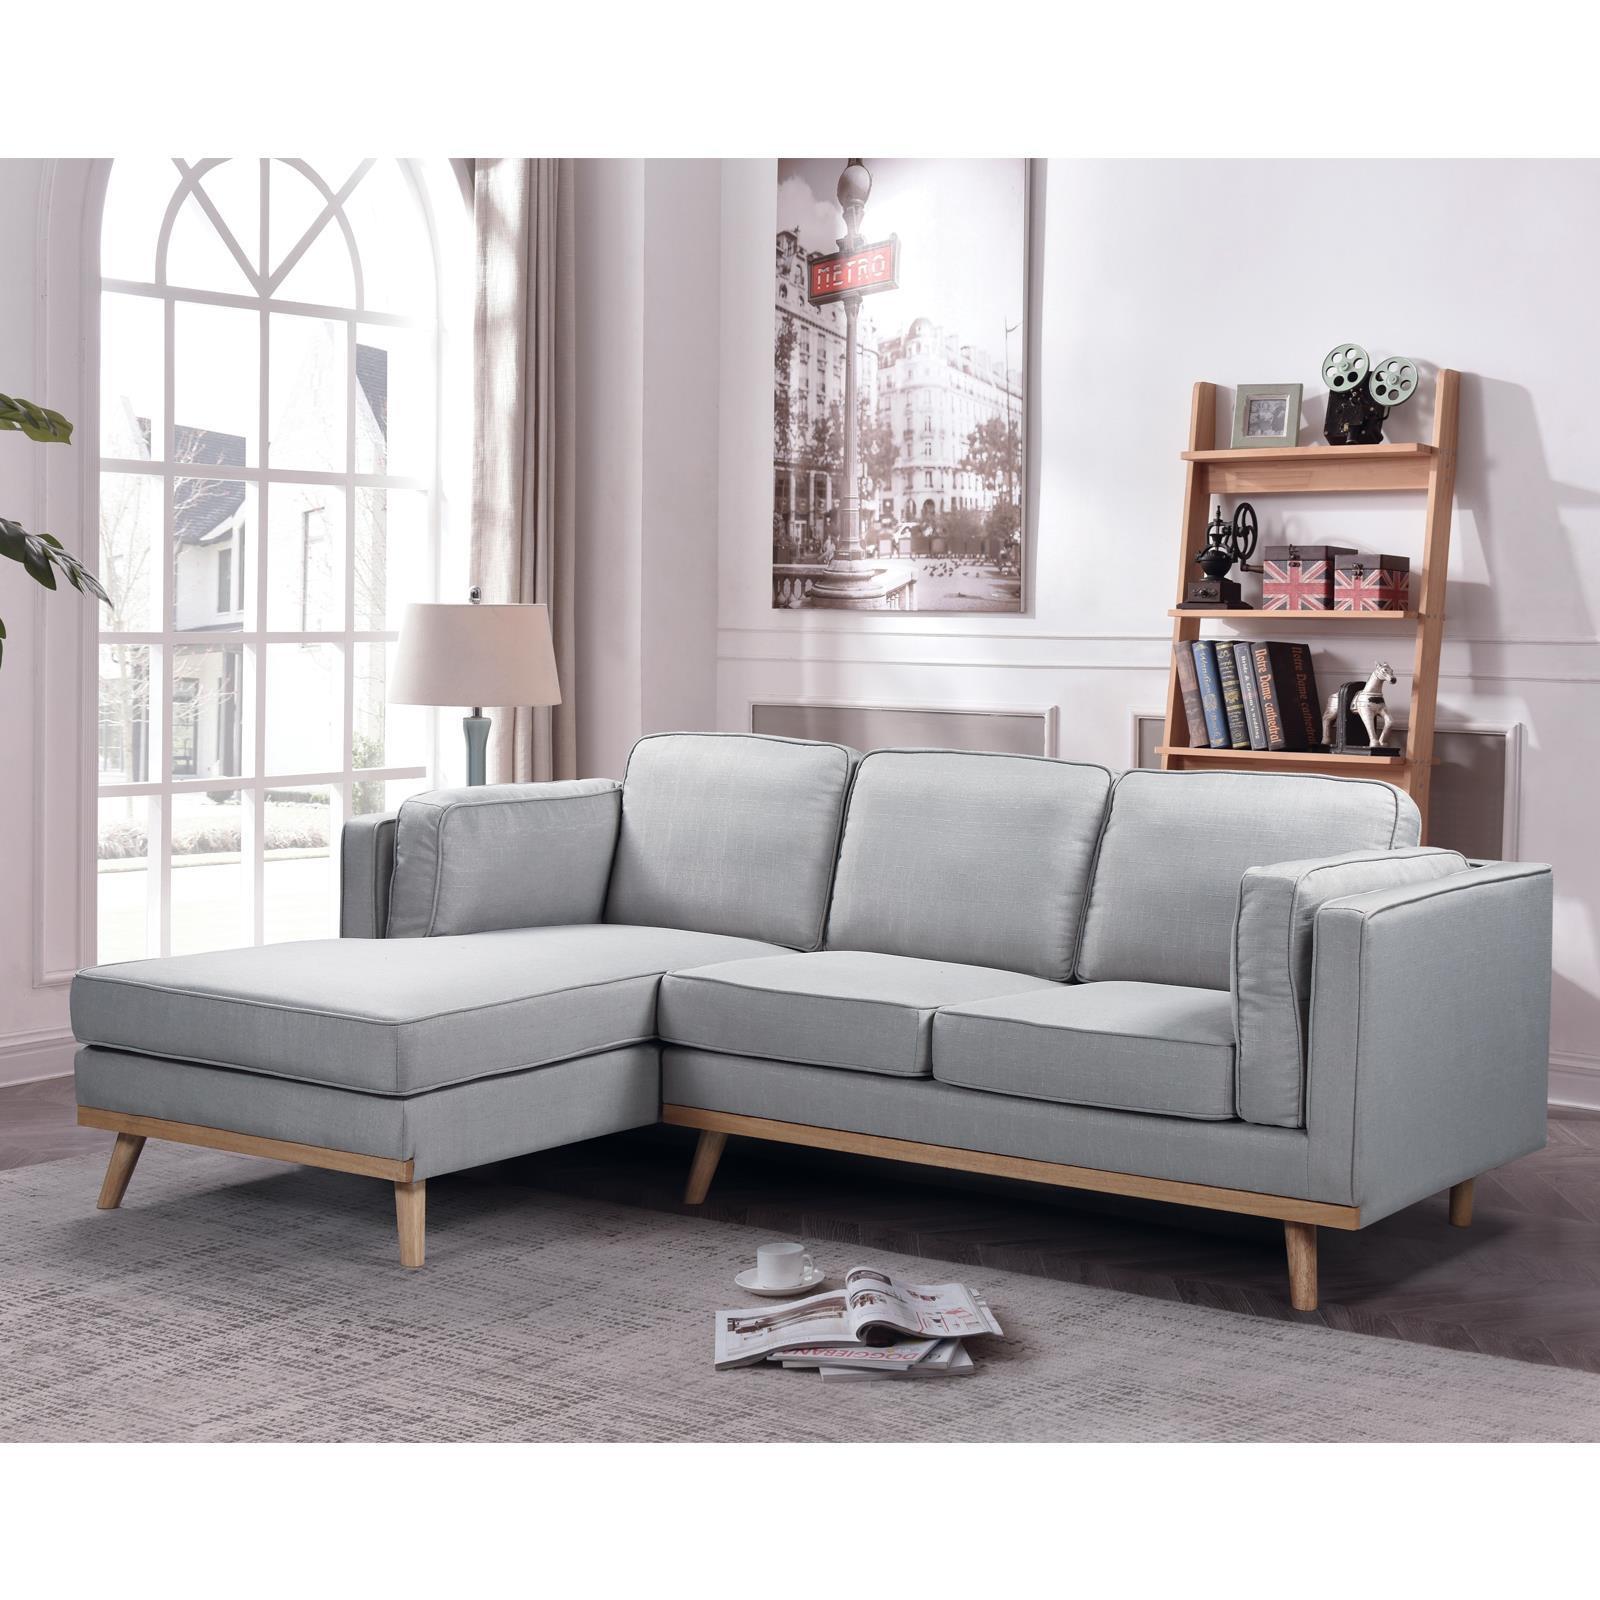 CHAMBER καναπές με δεξιά γωνία Y90x233x160x87εκ. ύφασμα ανοιχτό γκρι